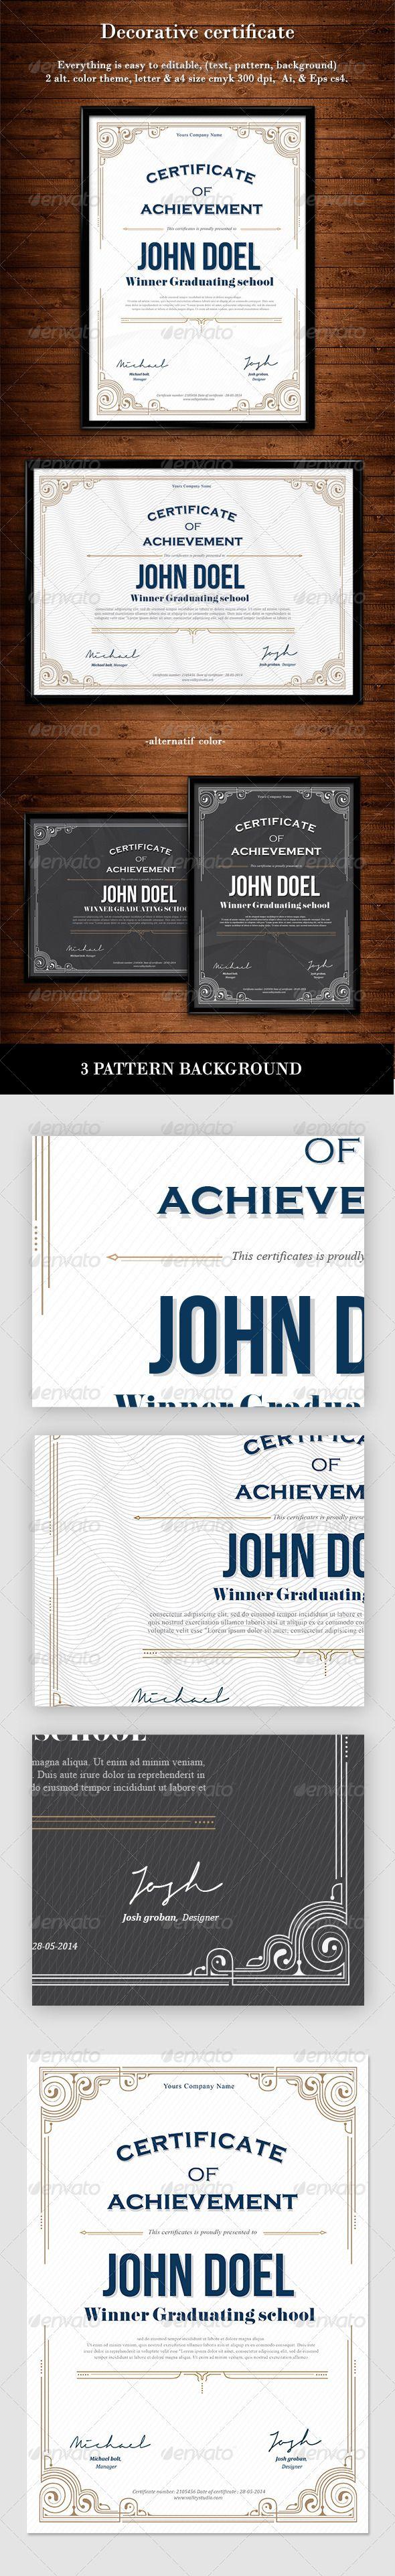 Decorative Certificate